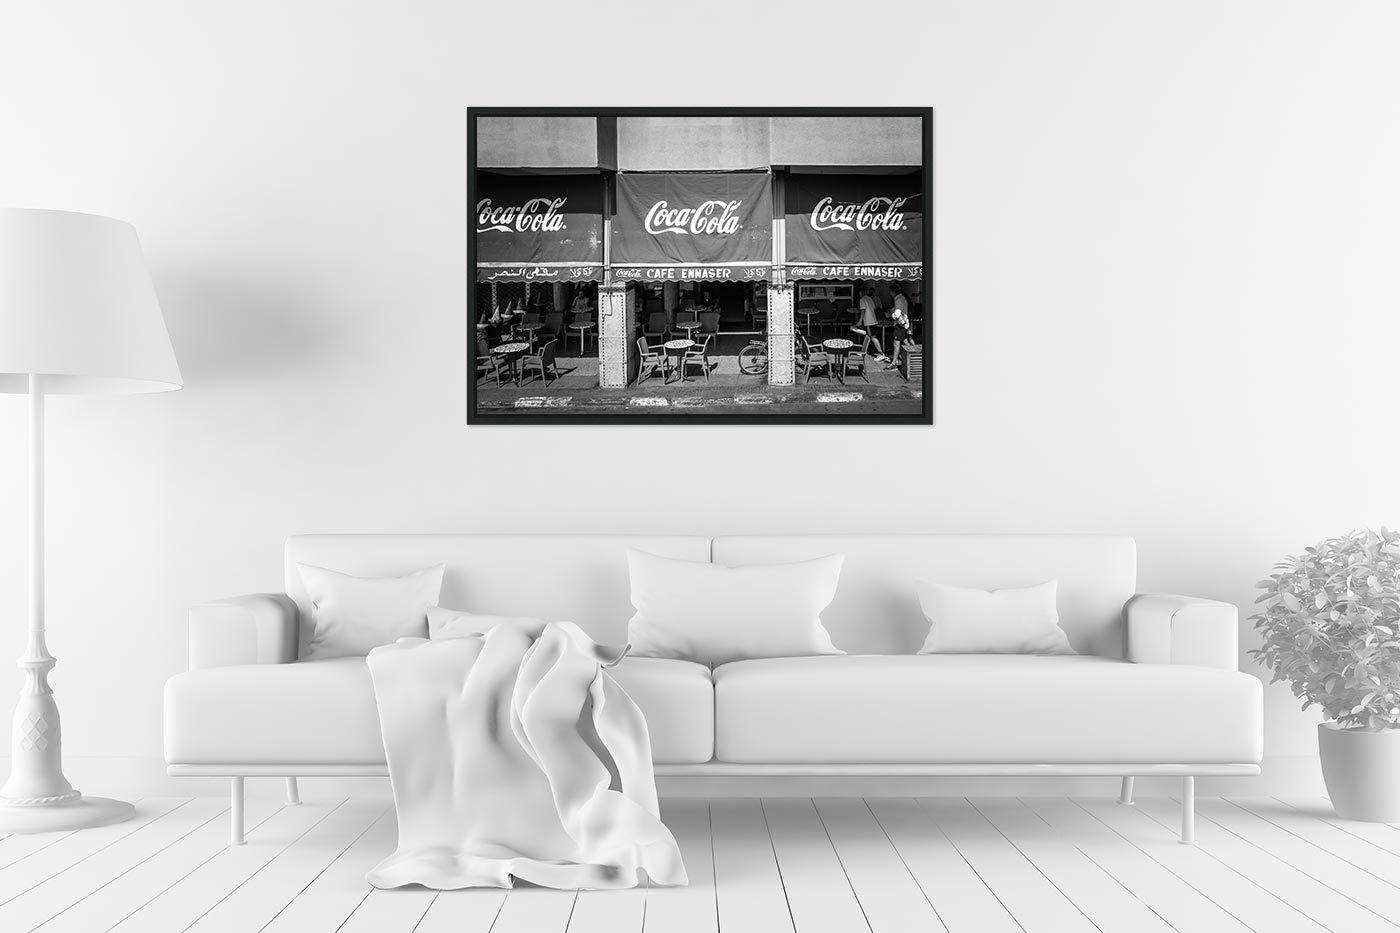 Caisse americaine 60x90 Cafe Ennaser